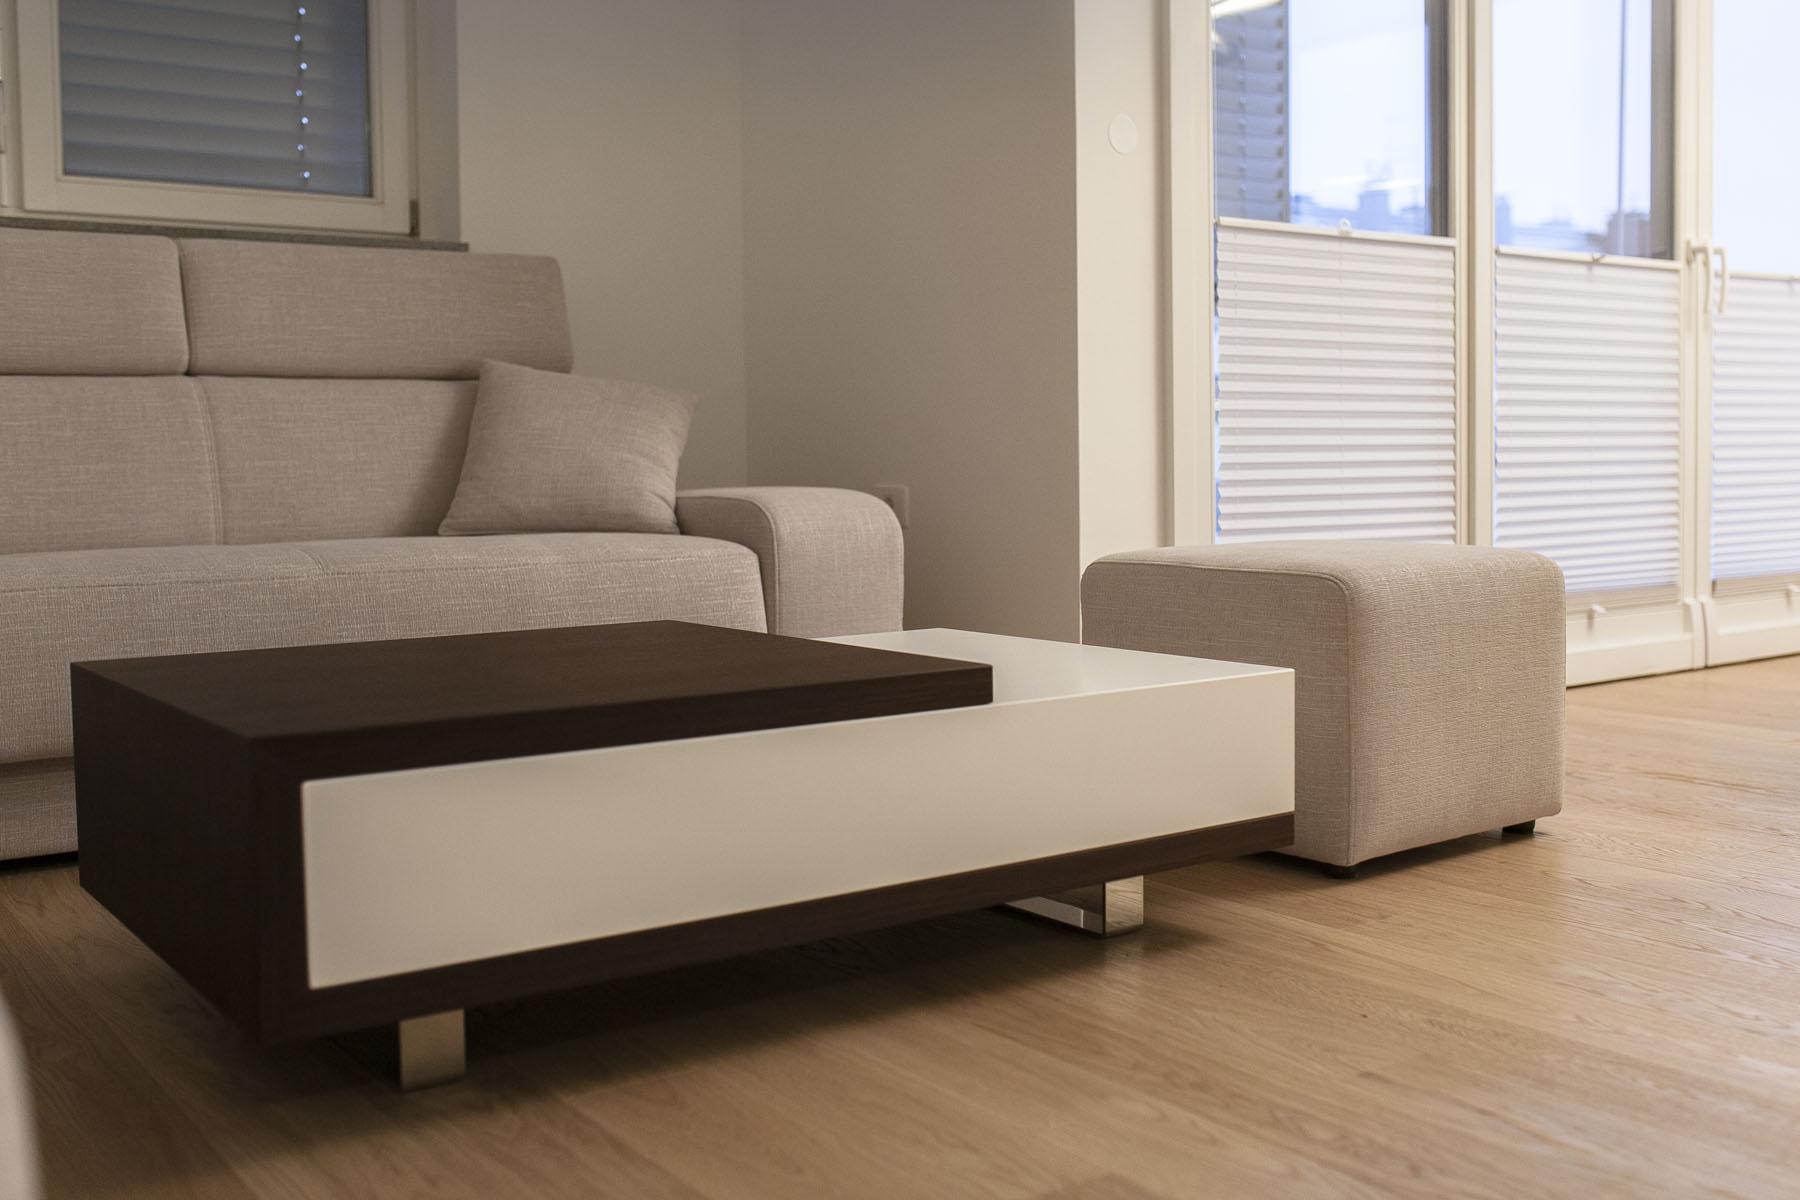 klubska miza za dnevno sobo po meri